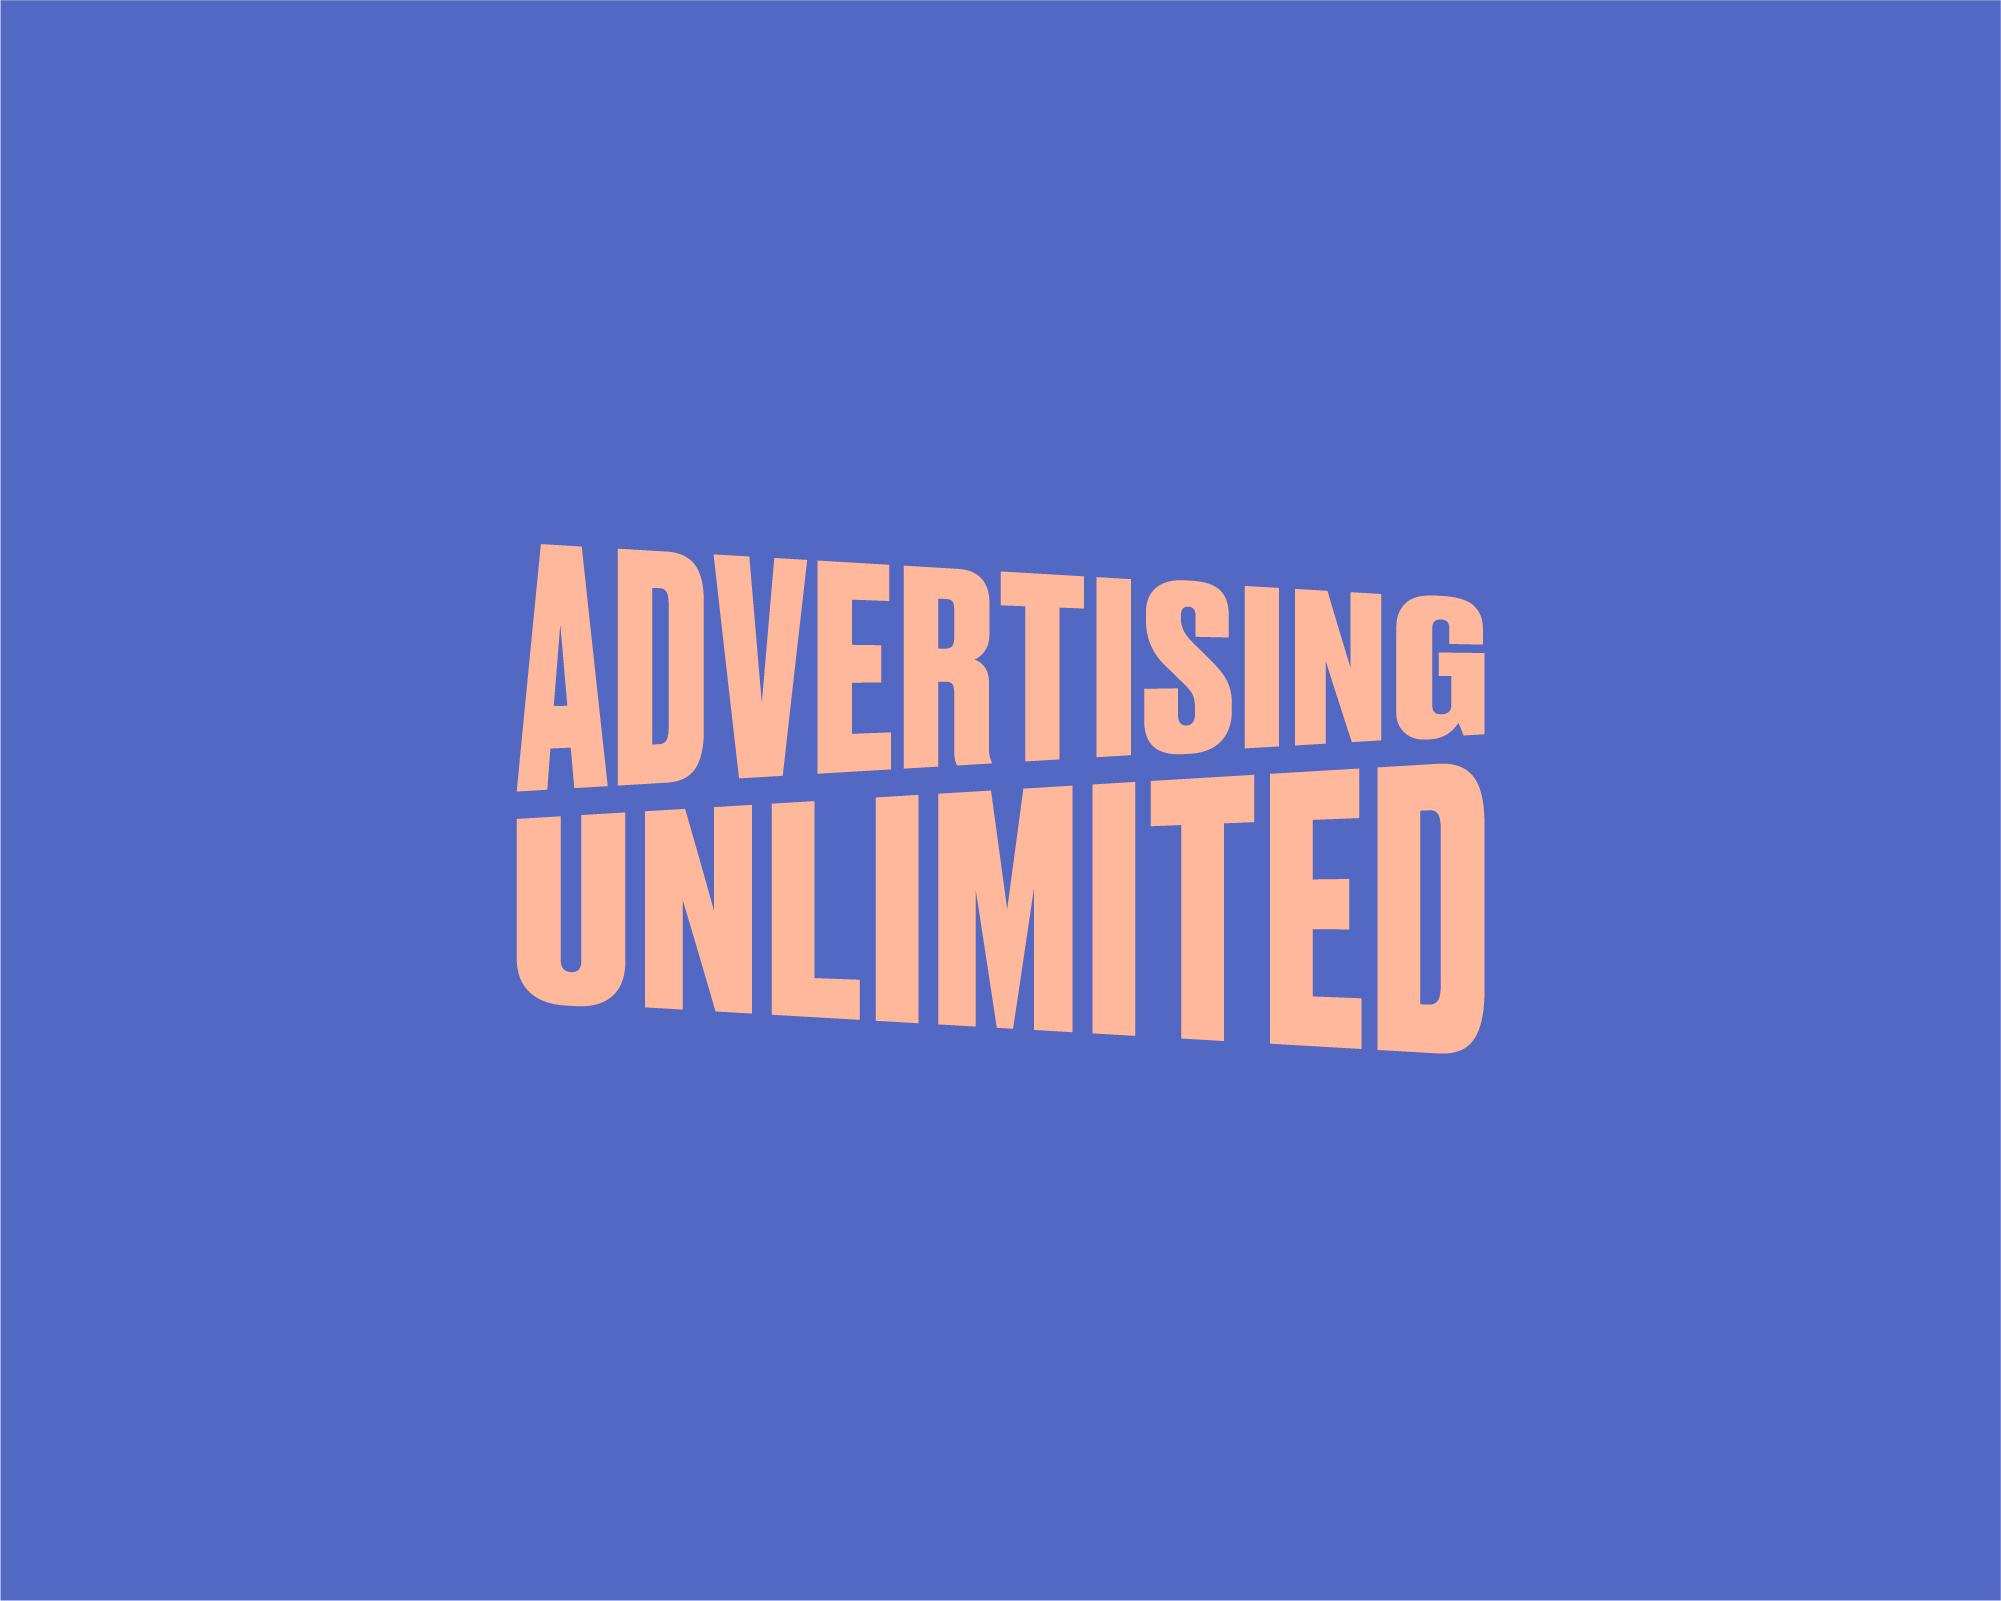 advertising_unlimited2.jpg